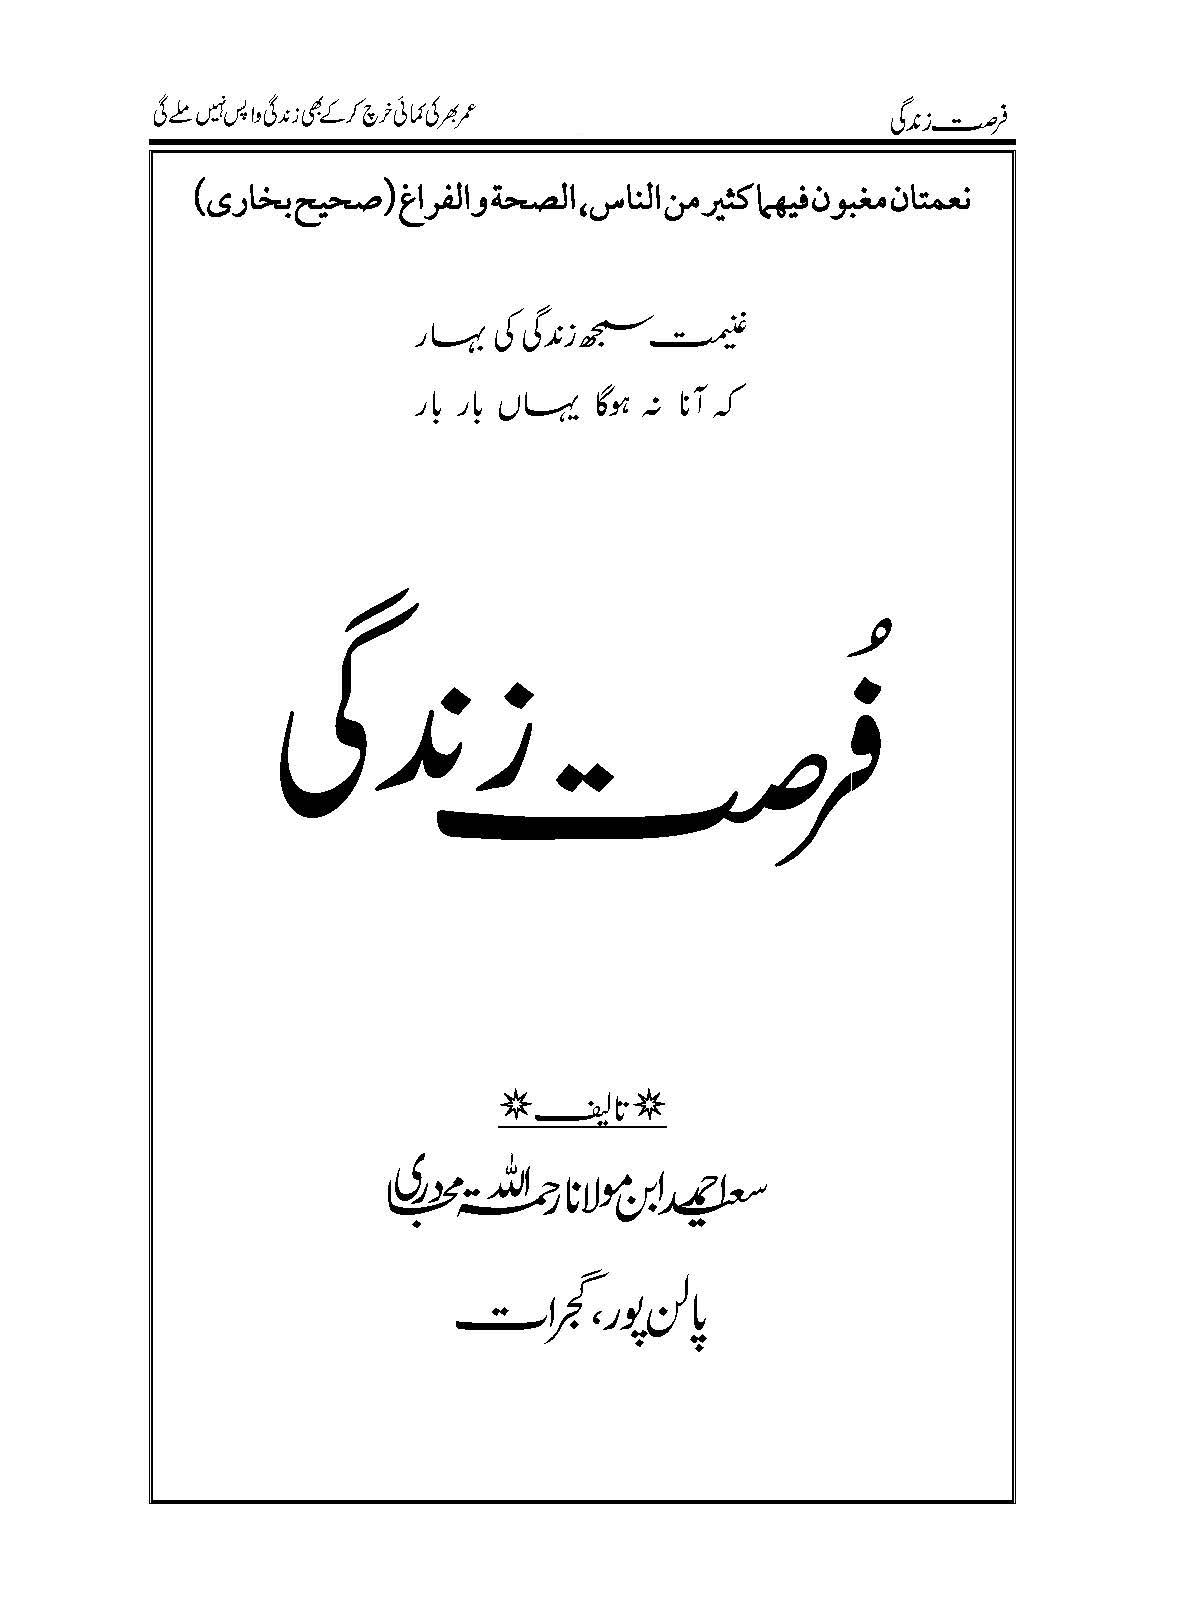 Fursat e Zindagi , Mufti Saeed Ahmad Qasmi